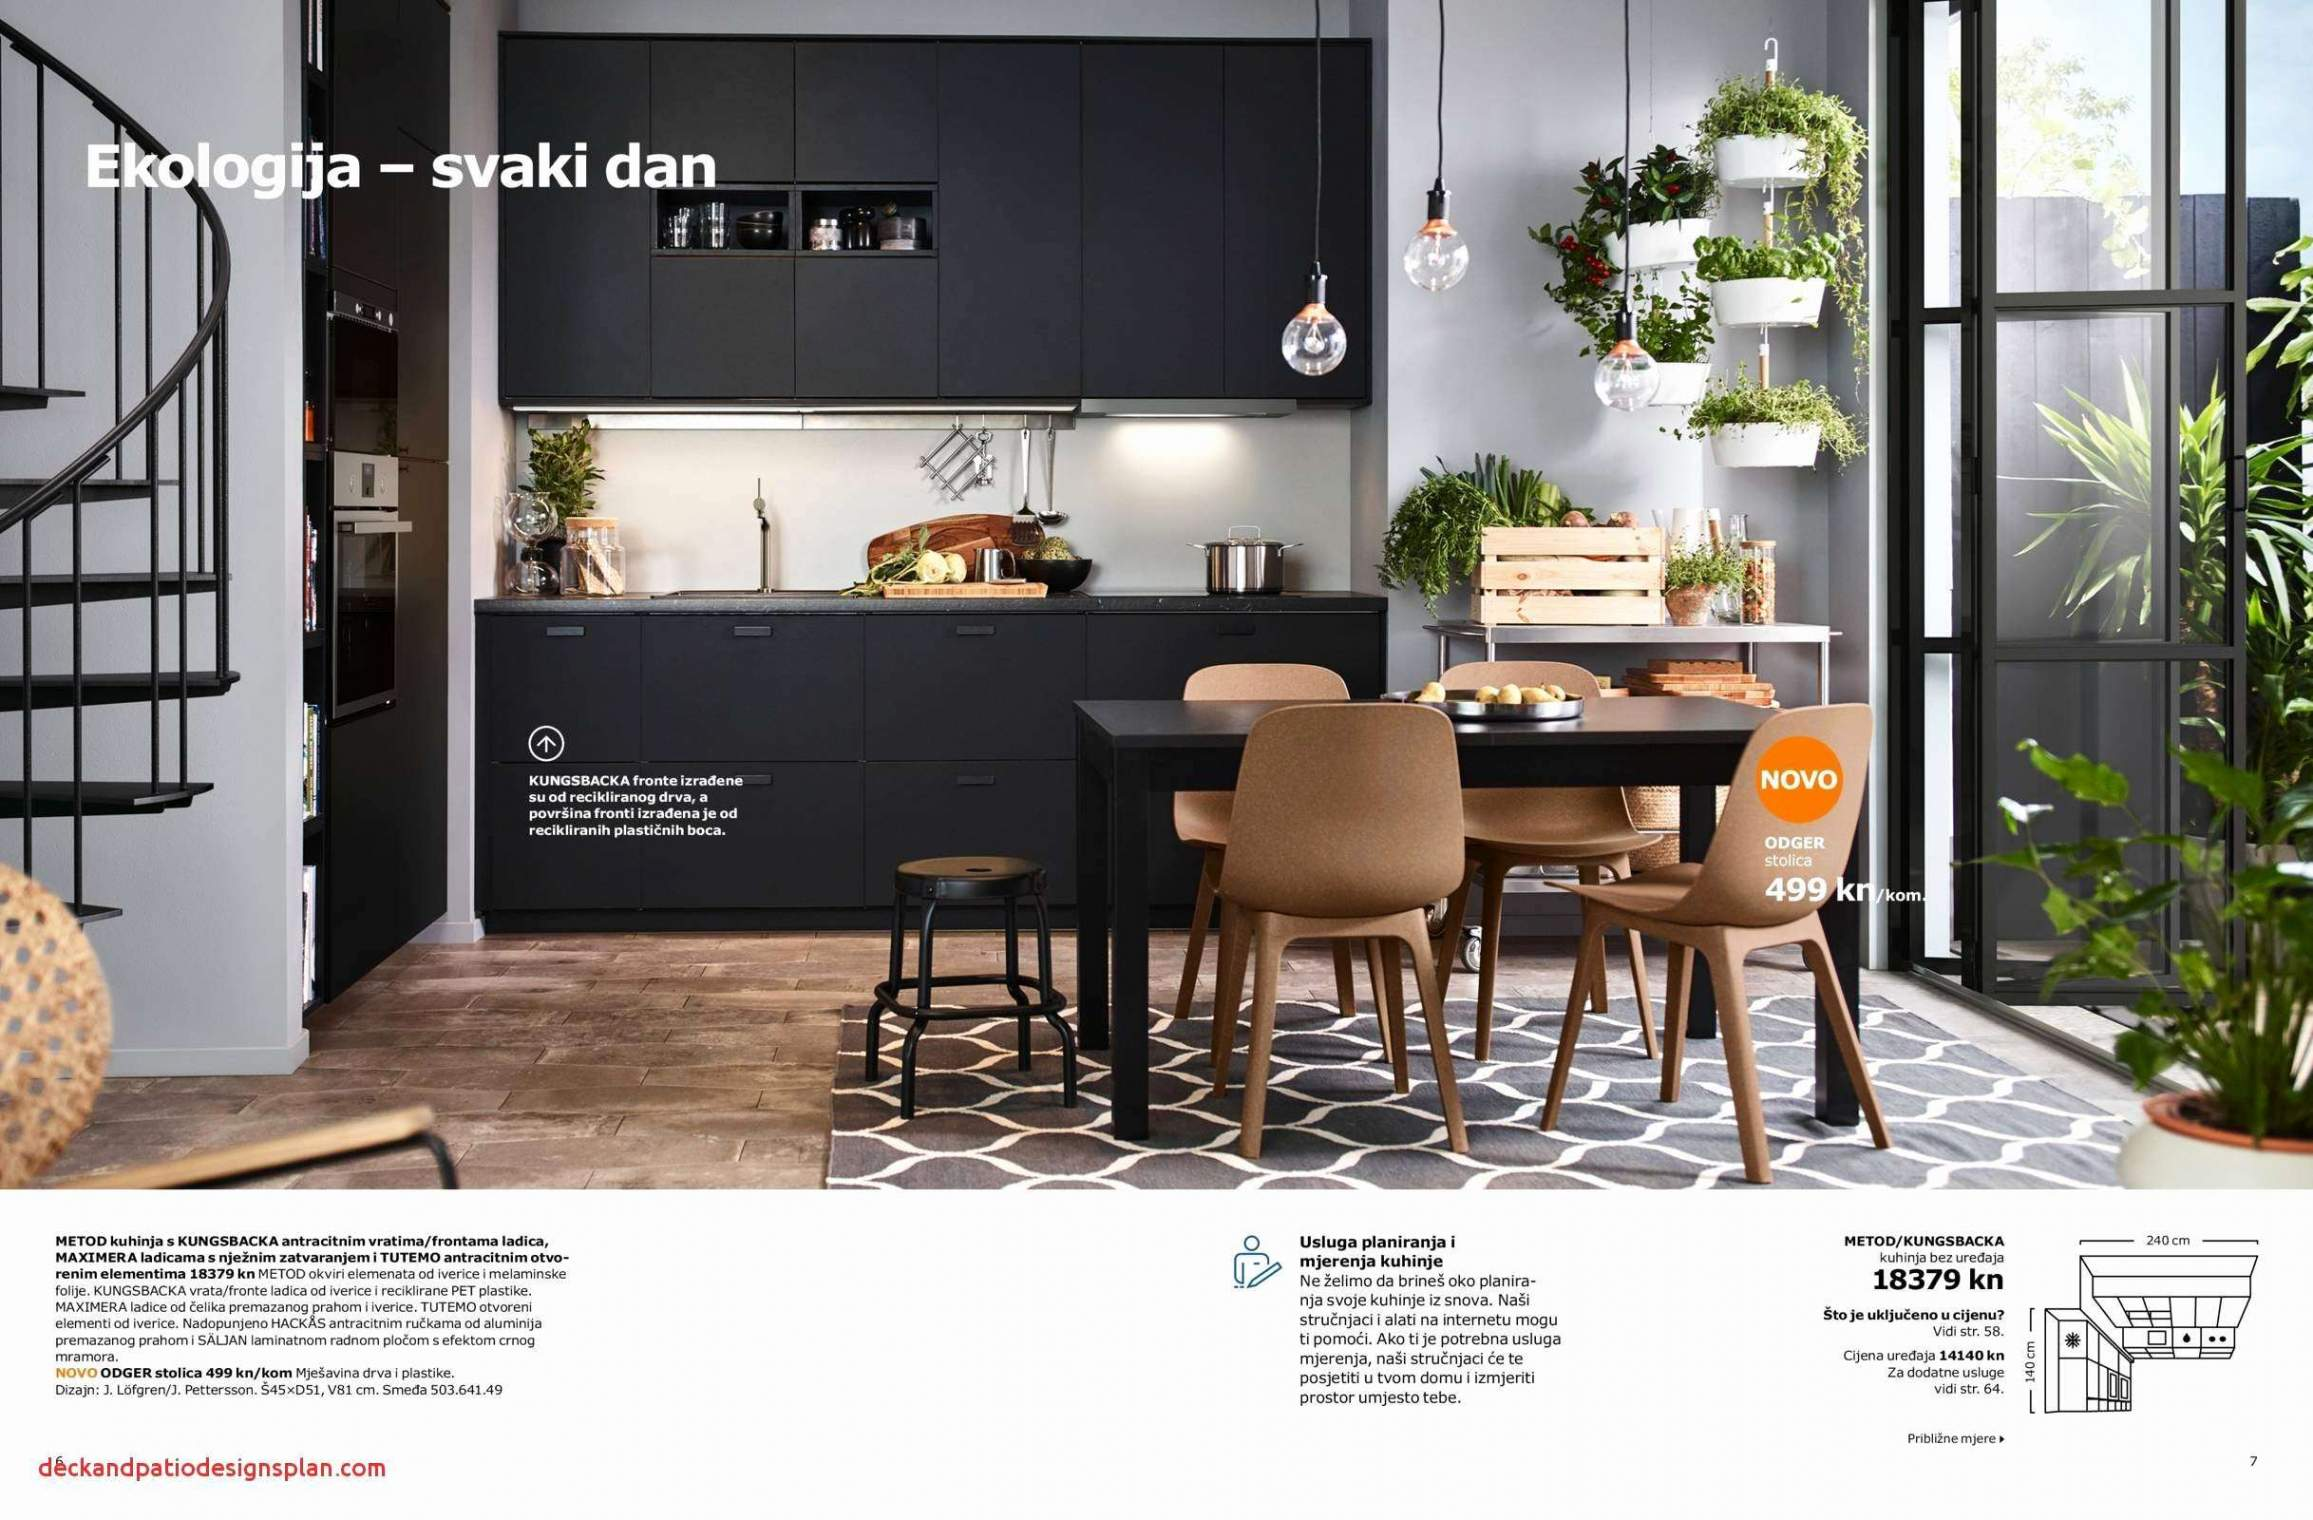 esstischgruppe 2019 02 02t18 kuchen lang pfungstadt kuchen lang pfungstadt